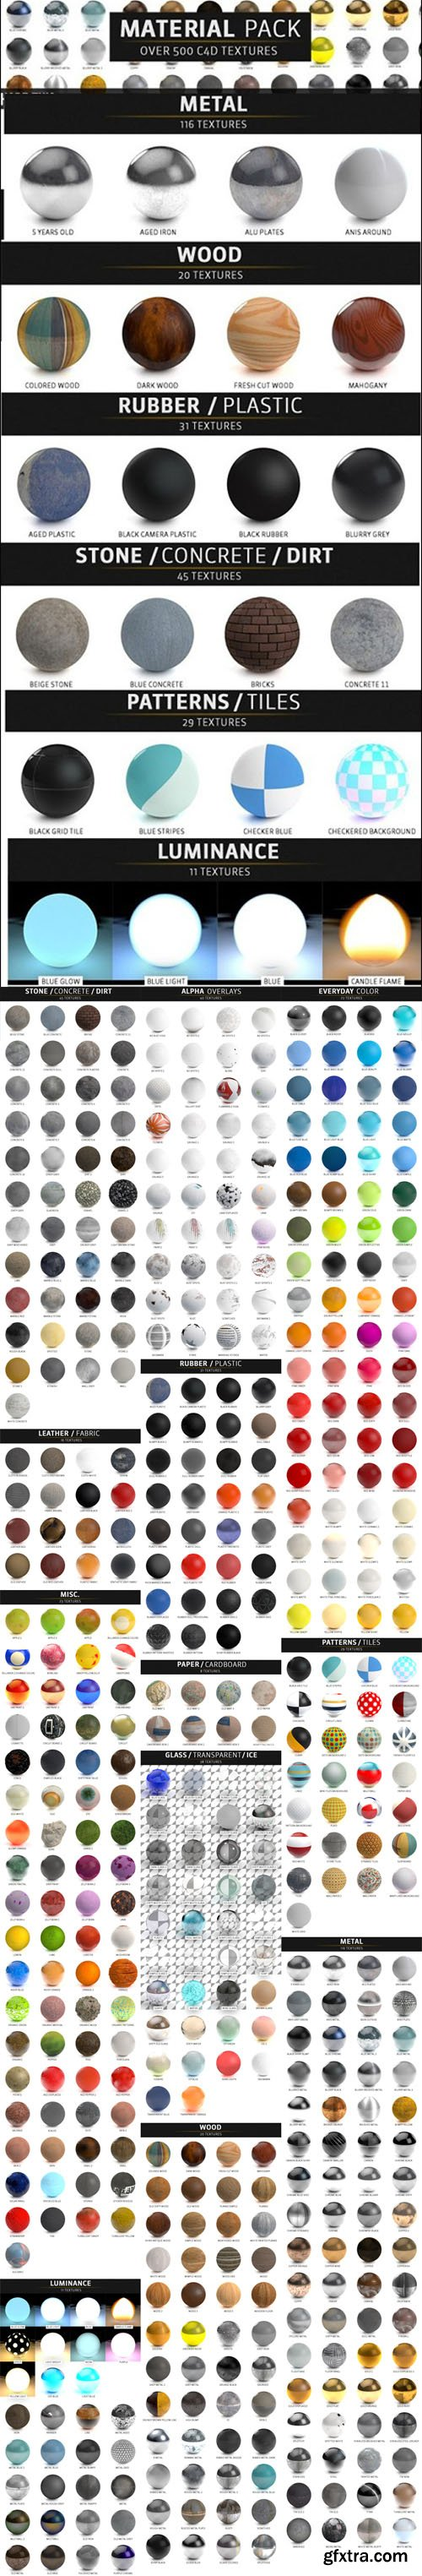 500+ Material Pack - Cinema 4D Textures (lib4d)